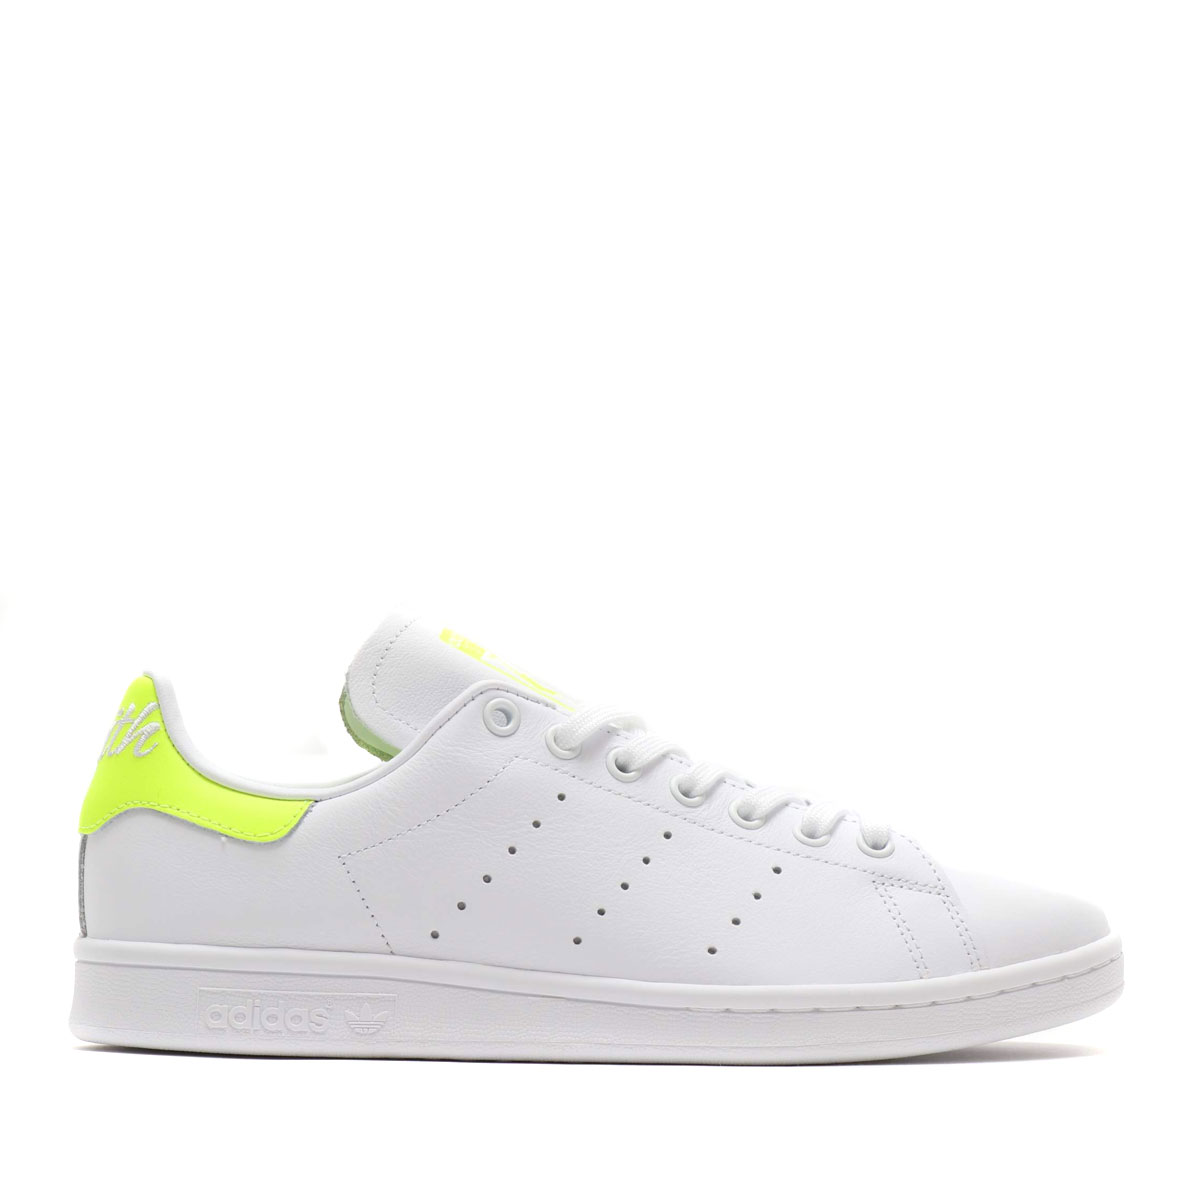 competitive price f5bd6 194ec adidas Originals STAN SMITH (Adidas originals Stan Smith) RUNNING  WHITE/SOLAR YELLOW/RUNNING WHITE 19FW-I